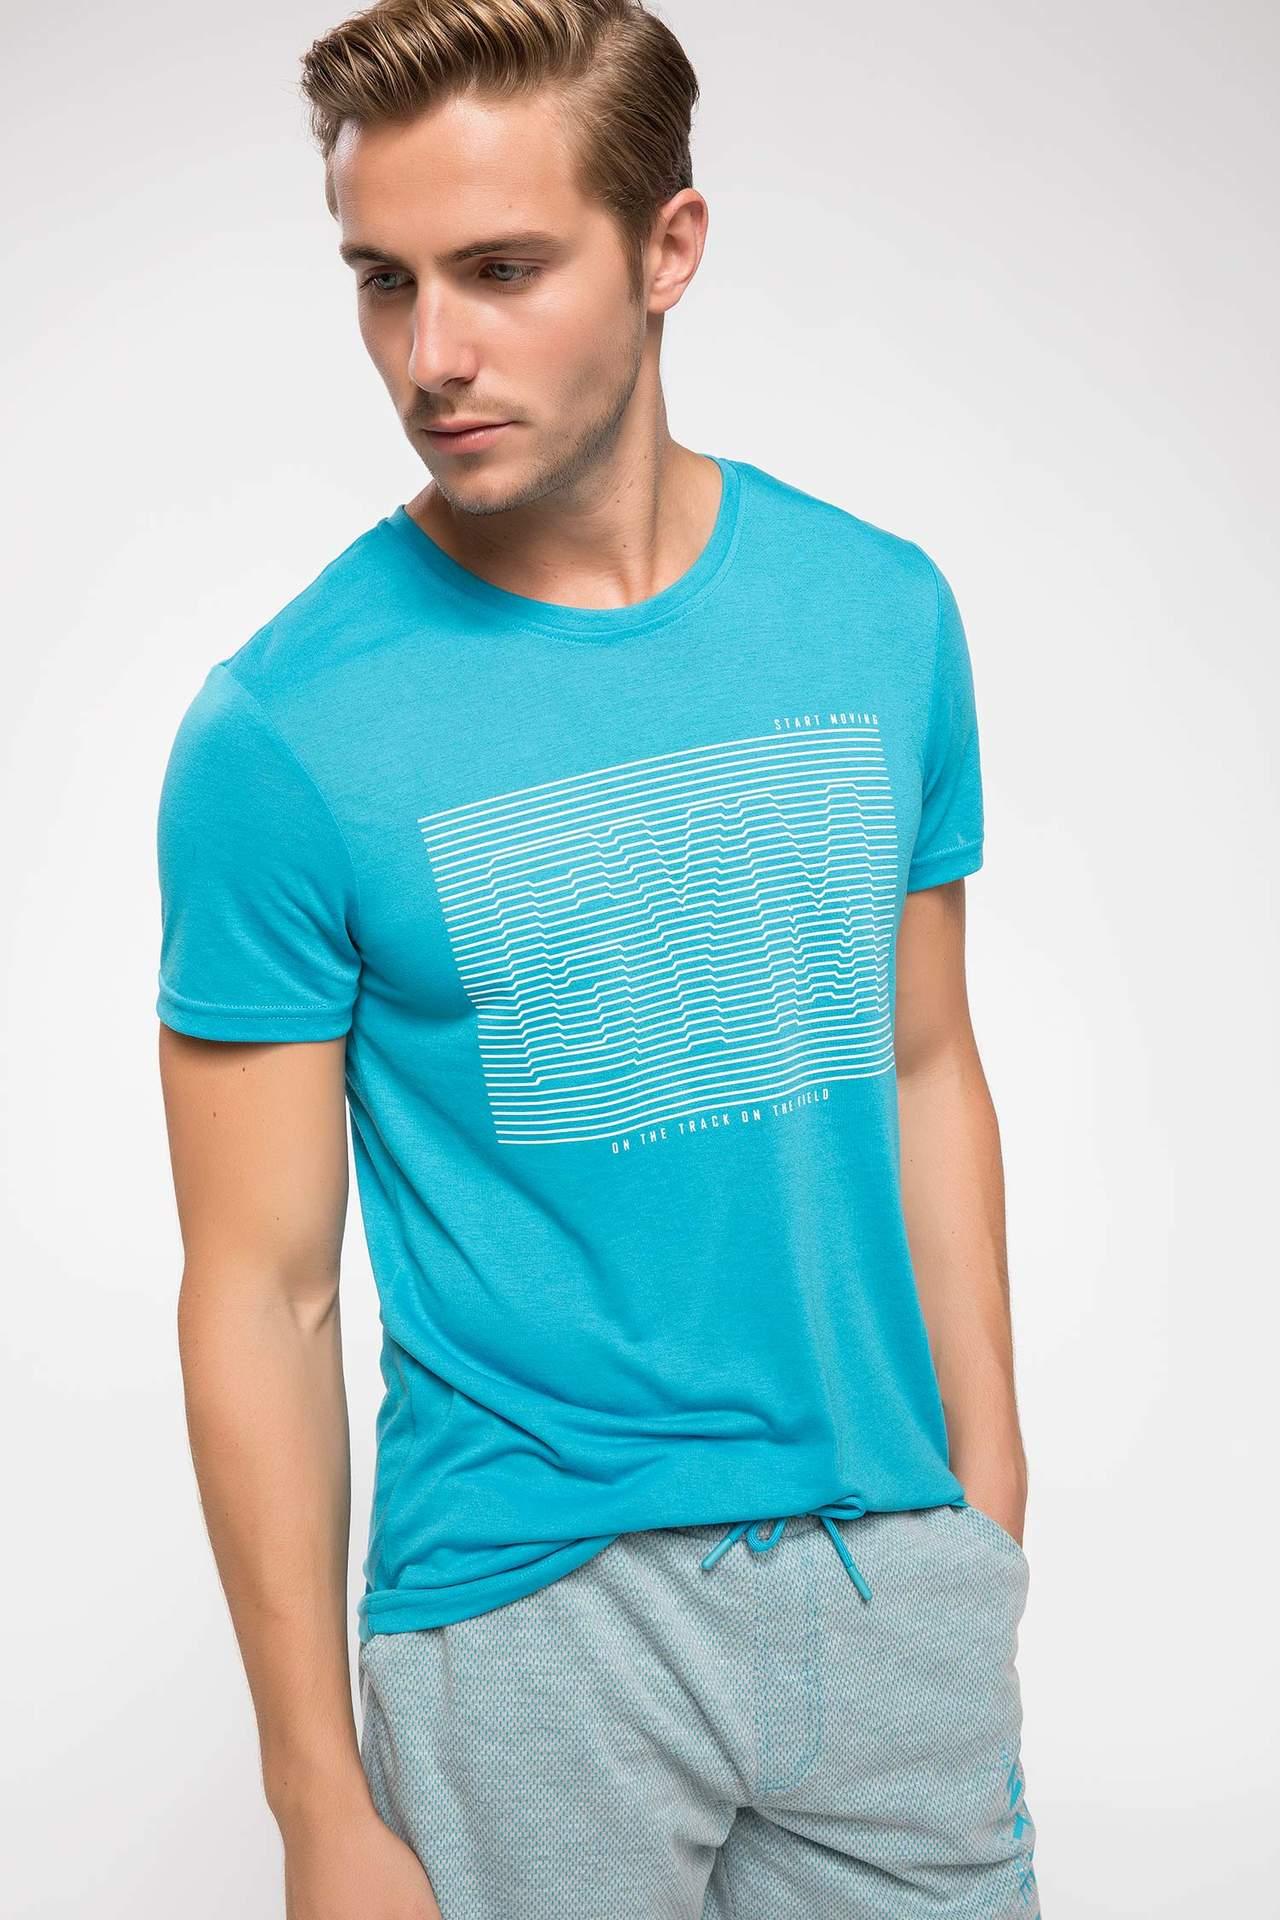 DeFacto Erkek 3D Baskılı Slim Fit Sporcu T-shirt Turkuaz male